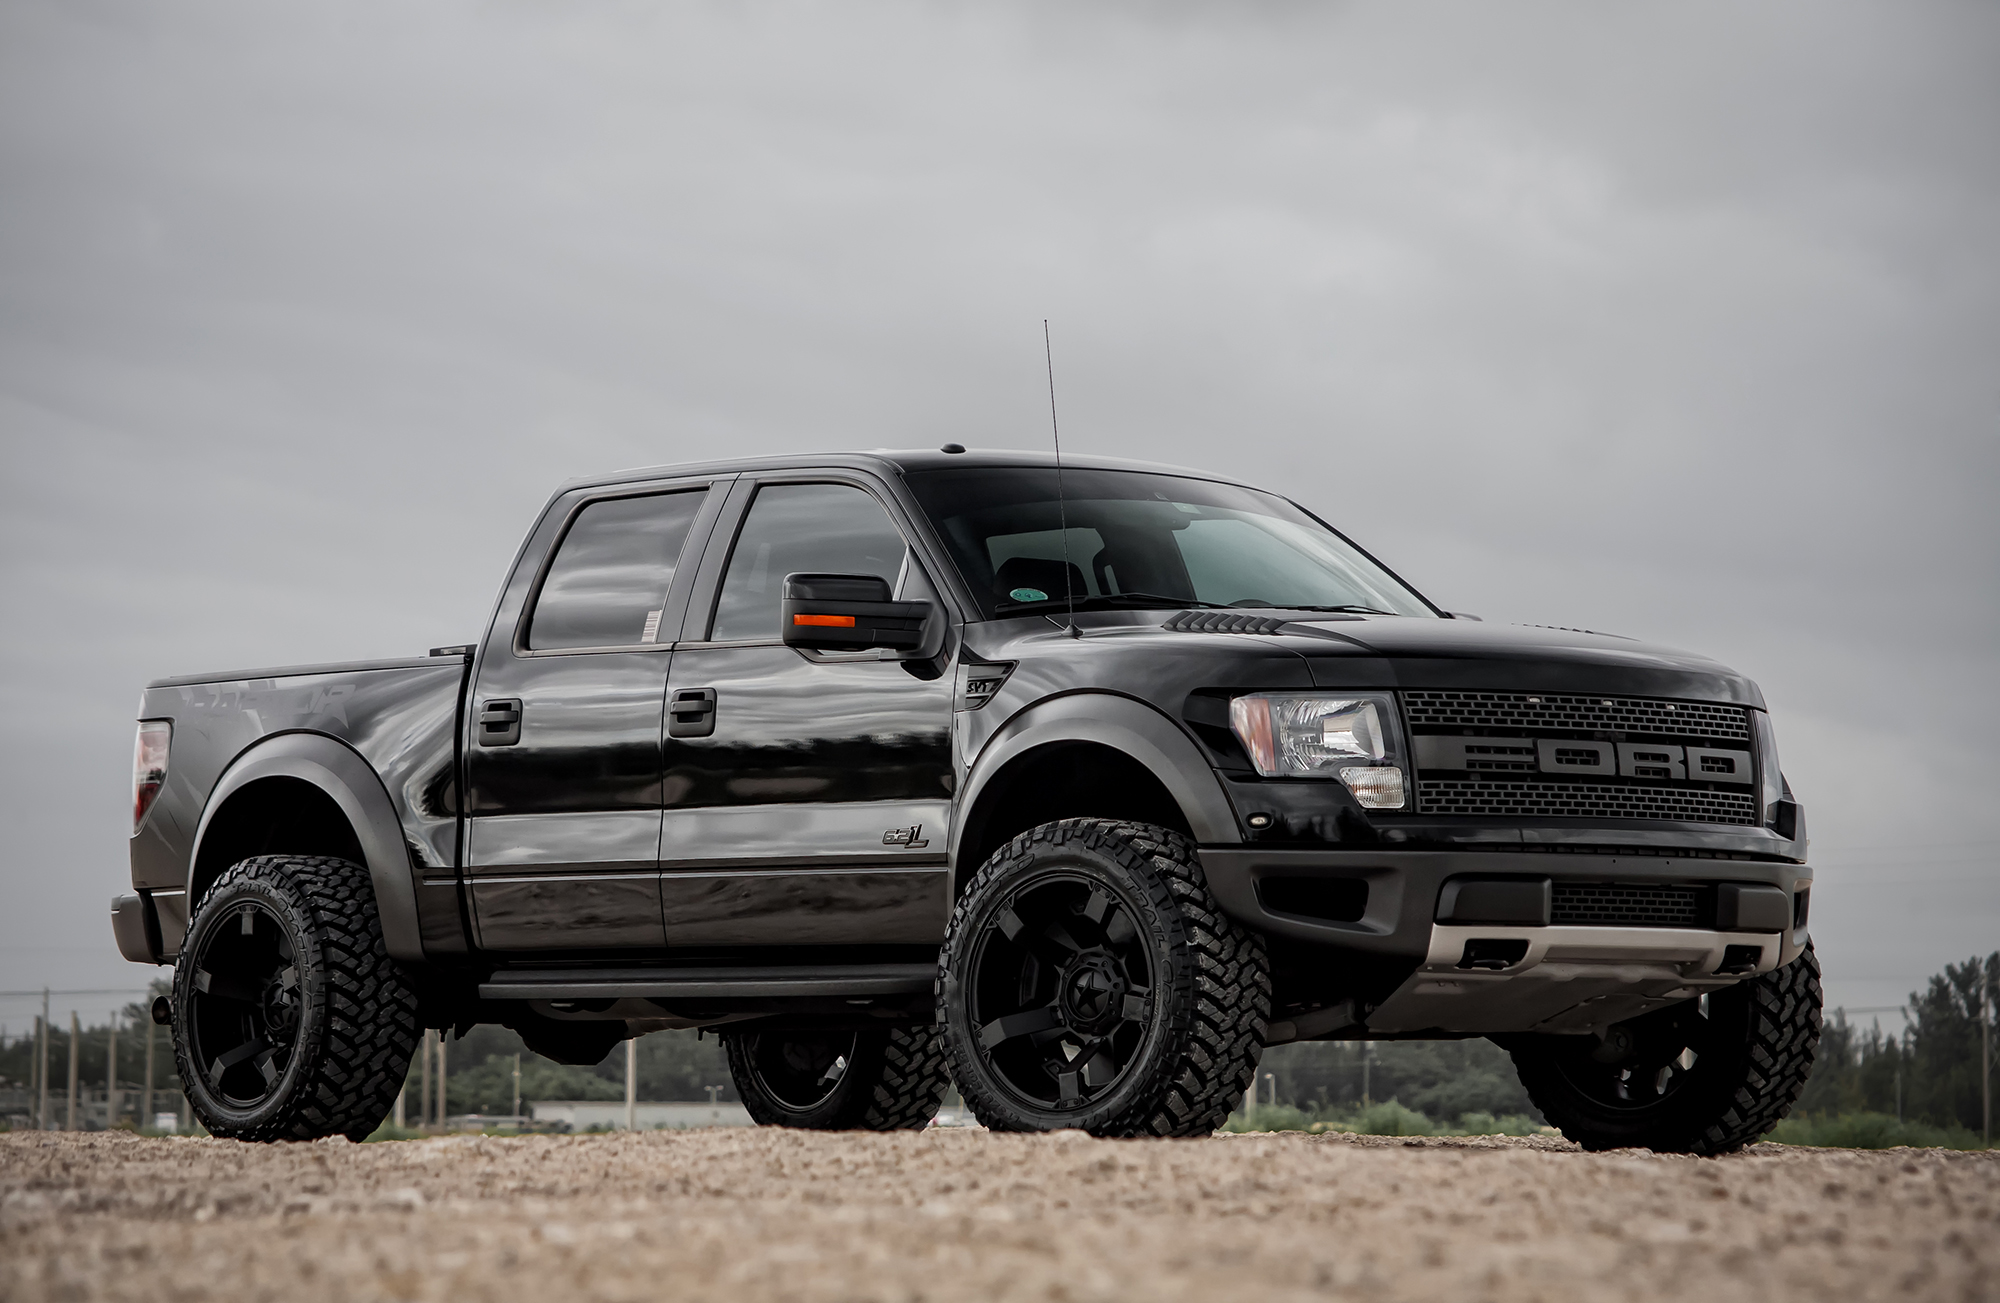 Ford F 150 2015 Raptor 2015 Ford Raptor SVT Black Custom HD Wallpaper 2000x1303